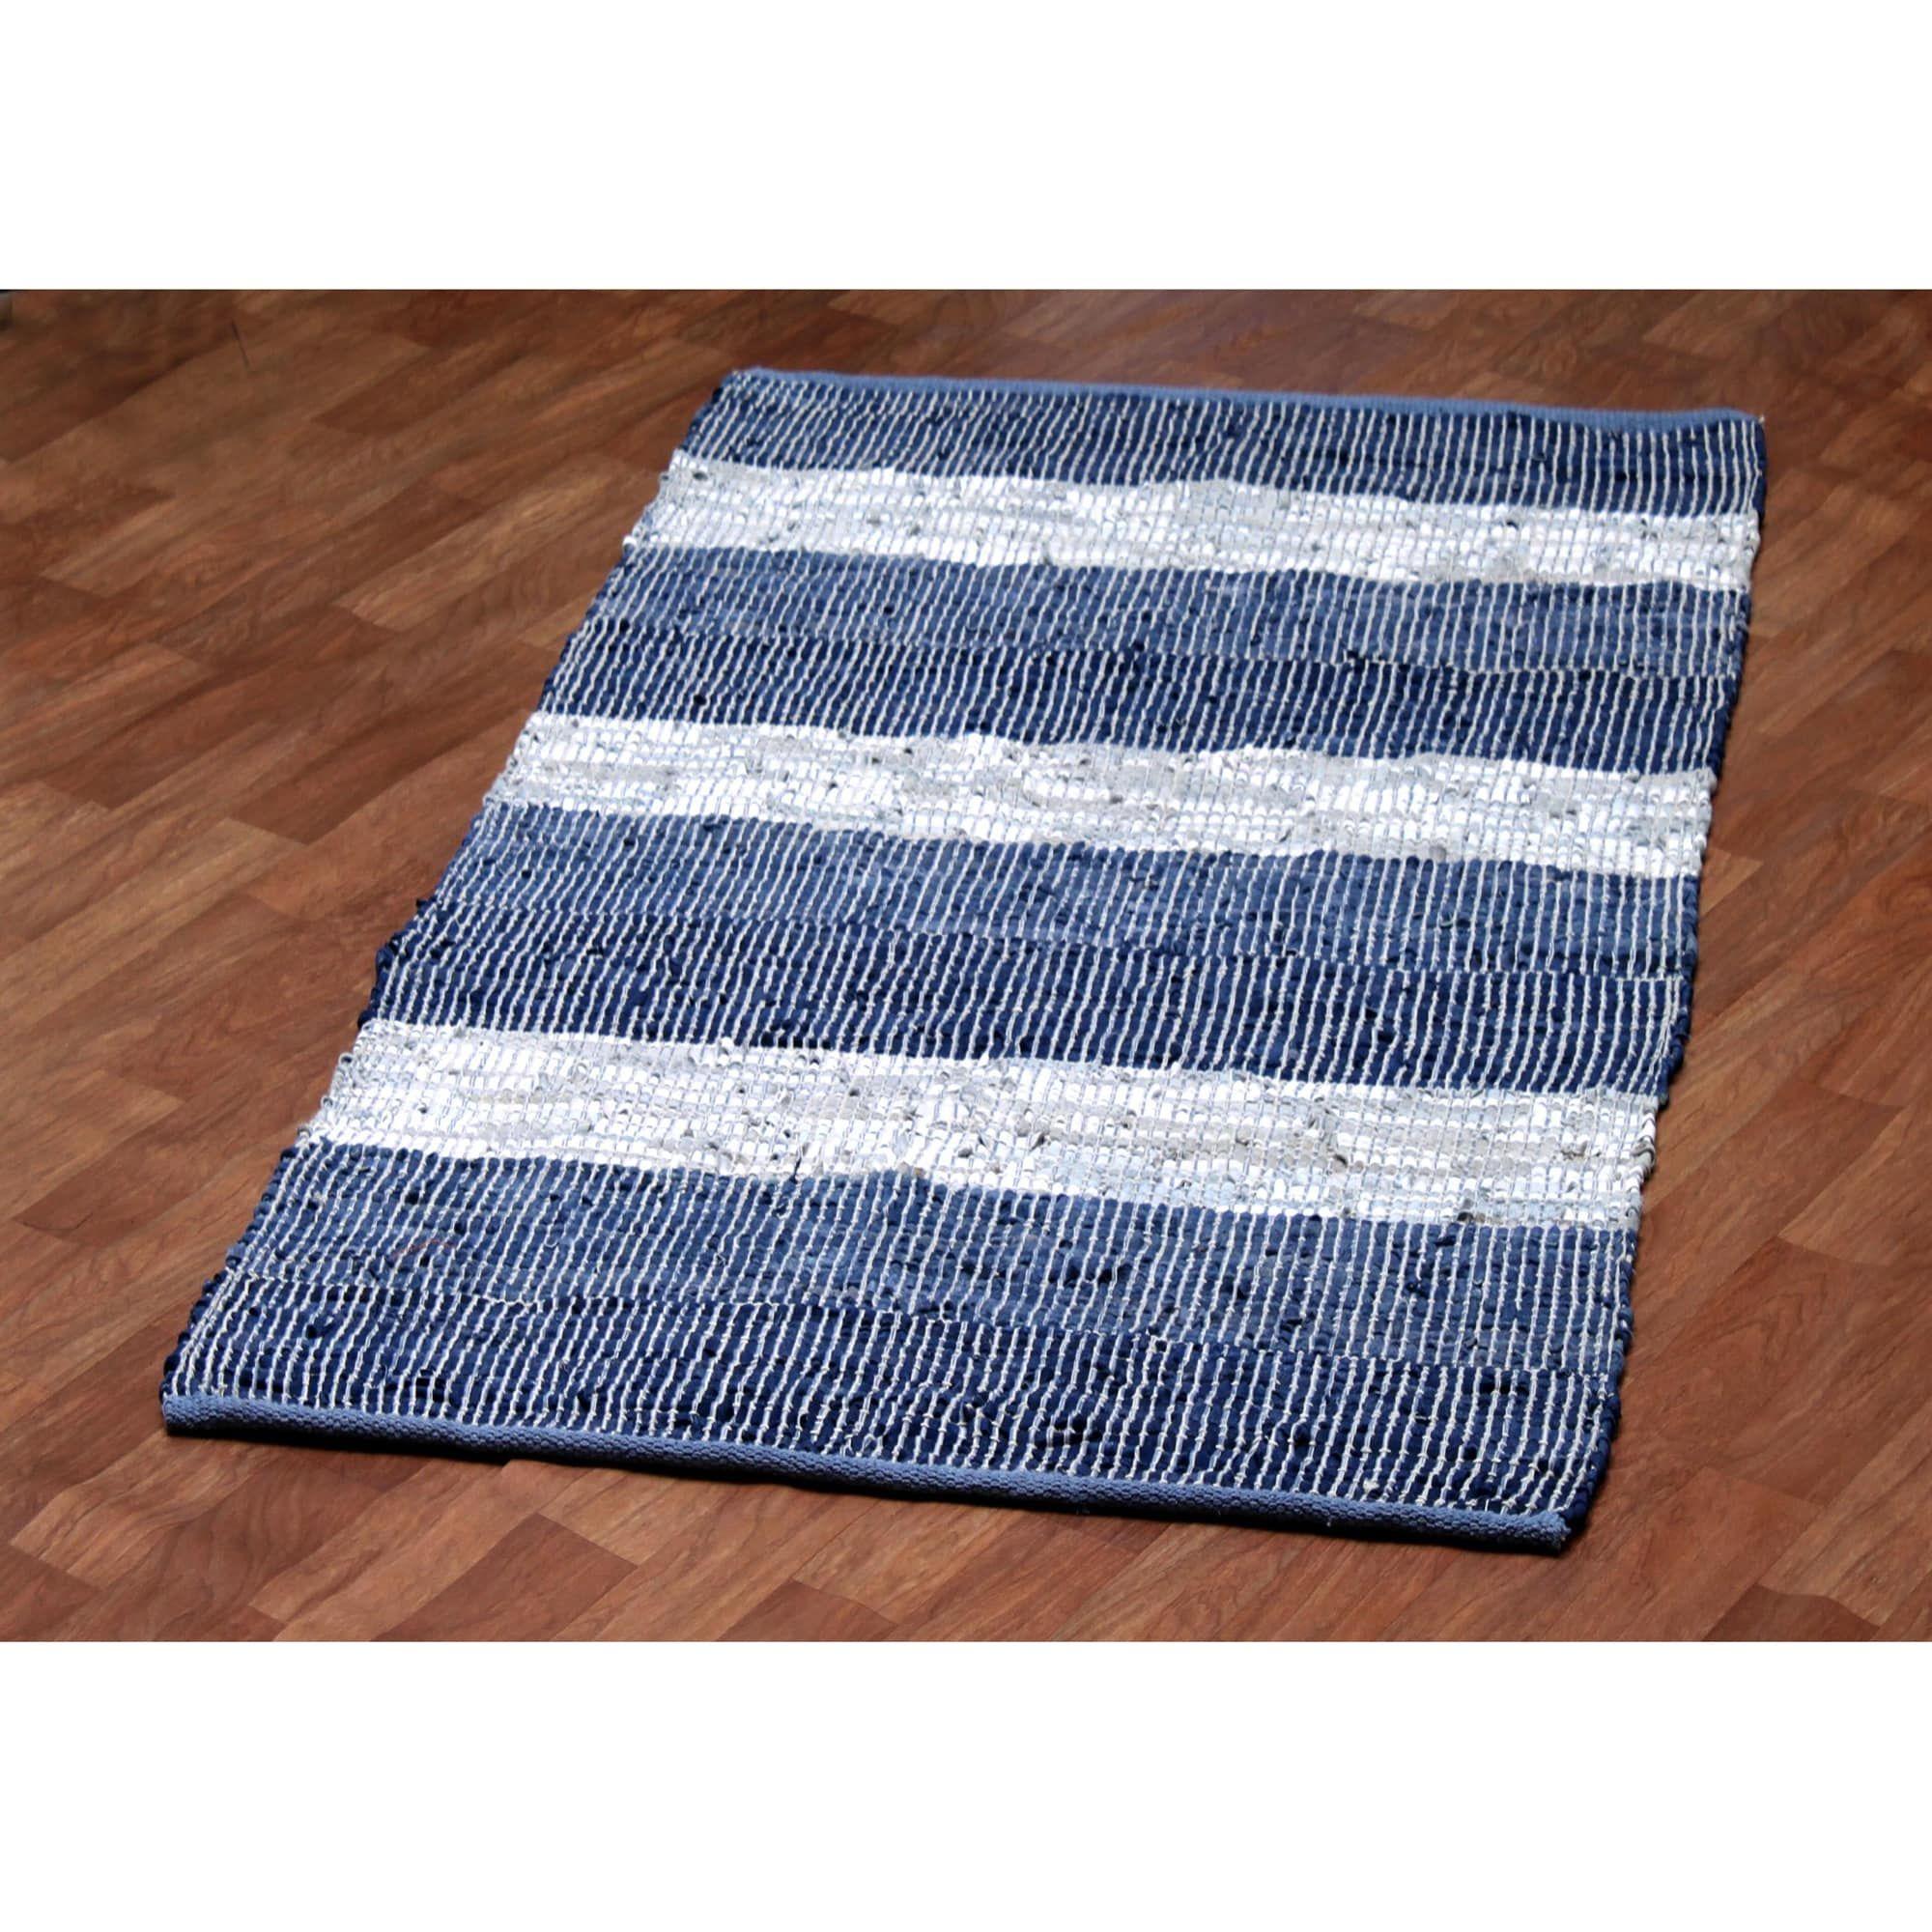 Hand Woven Matador Blue Stripe Leather Rug 8 X 10 8 X 10